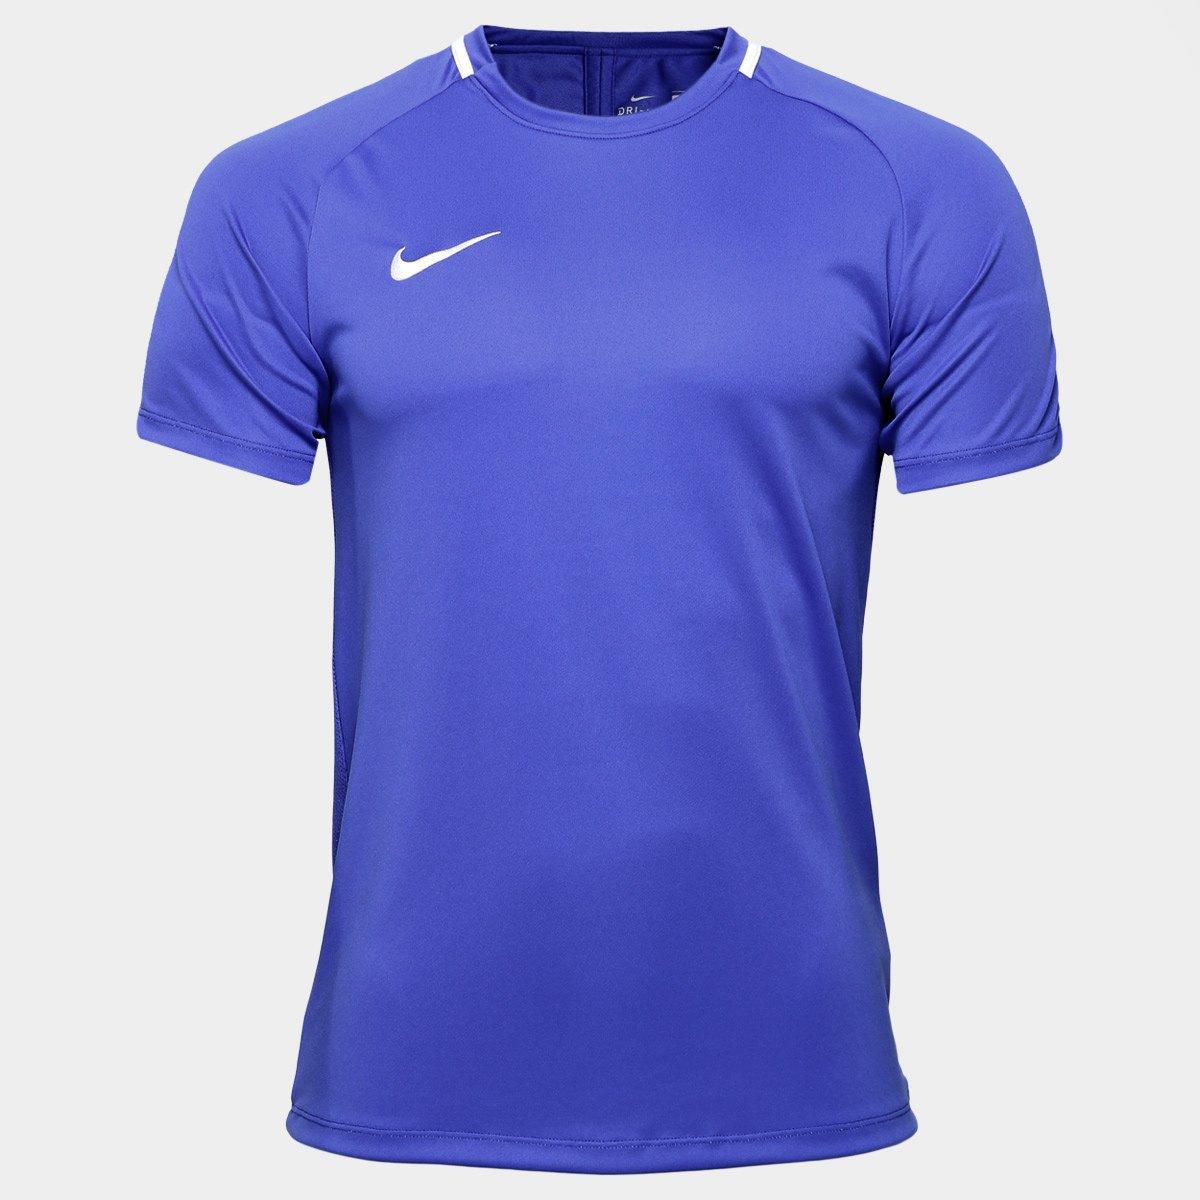 Camisa Nike Academy Masculina - Azul Royal e Branco - Compre Agora ... 3dbd76d2a0f